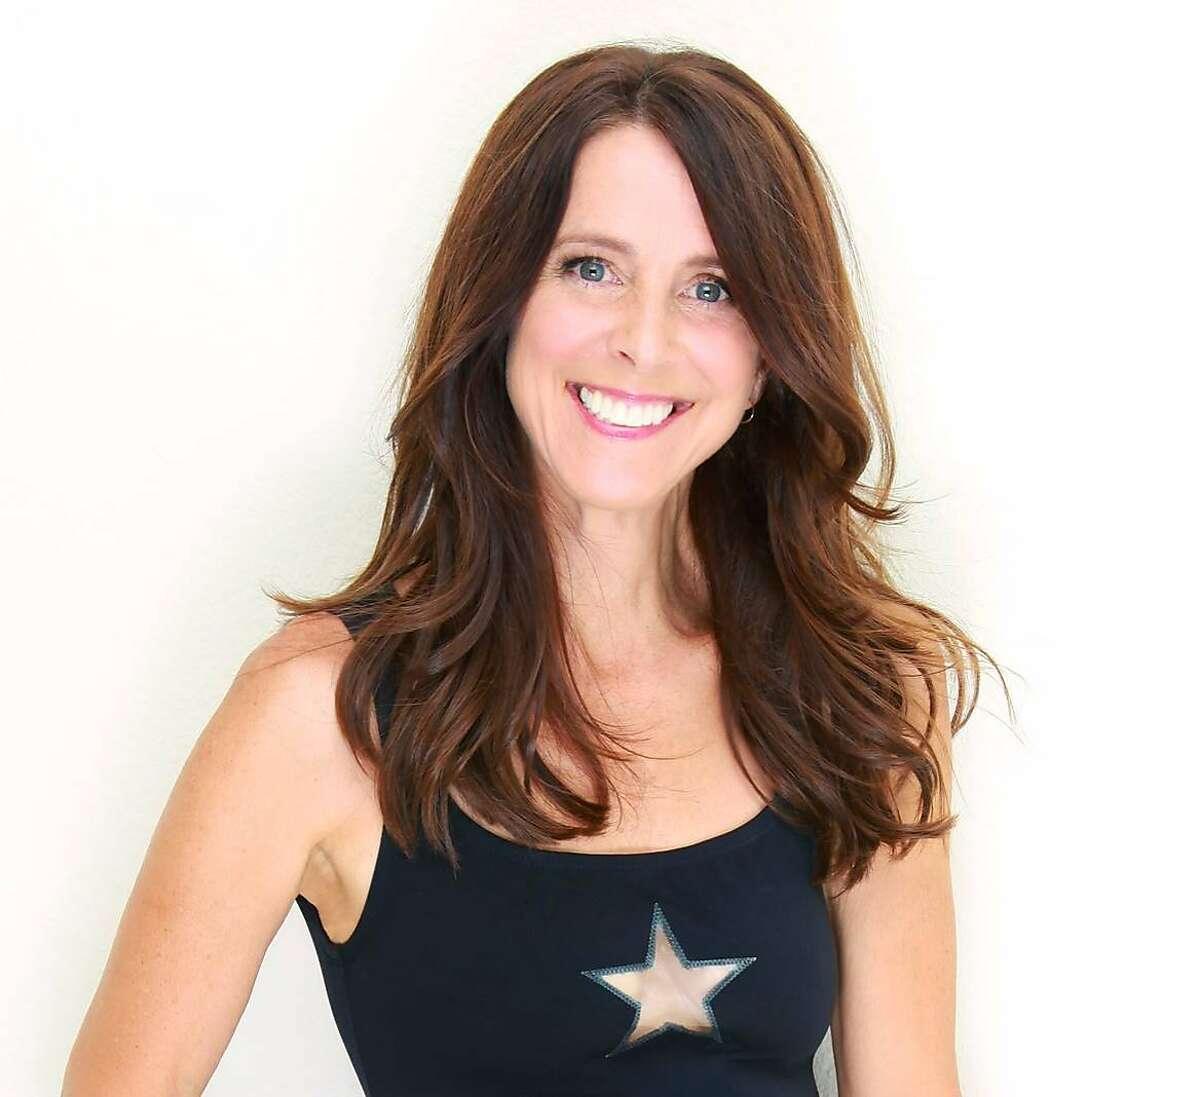 Martha Quinn, MTV queen, will host an '80s show on KOSF